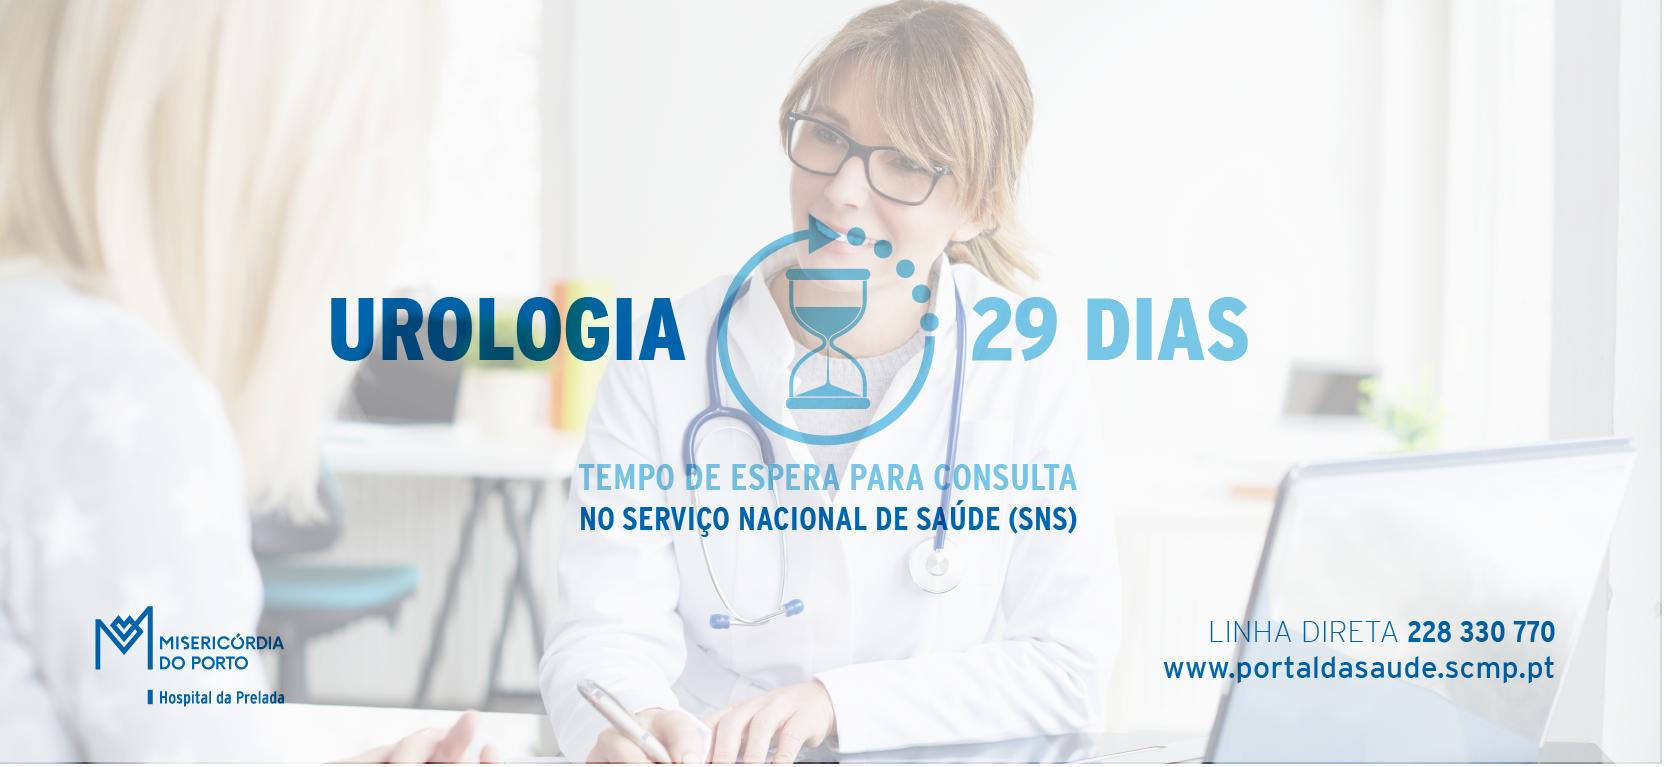 https://www.scmp.pt/assets/misc/img/2020/2020-02-28%20Noticias%20HP/urologia%20HP.png